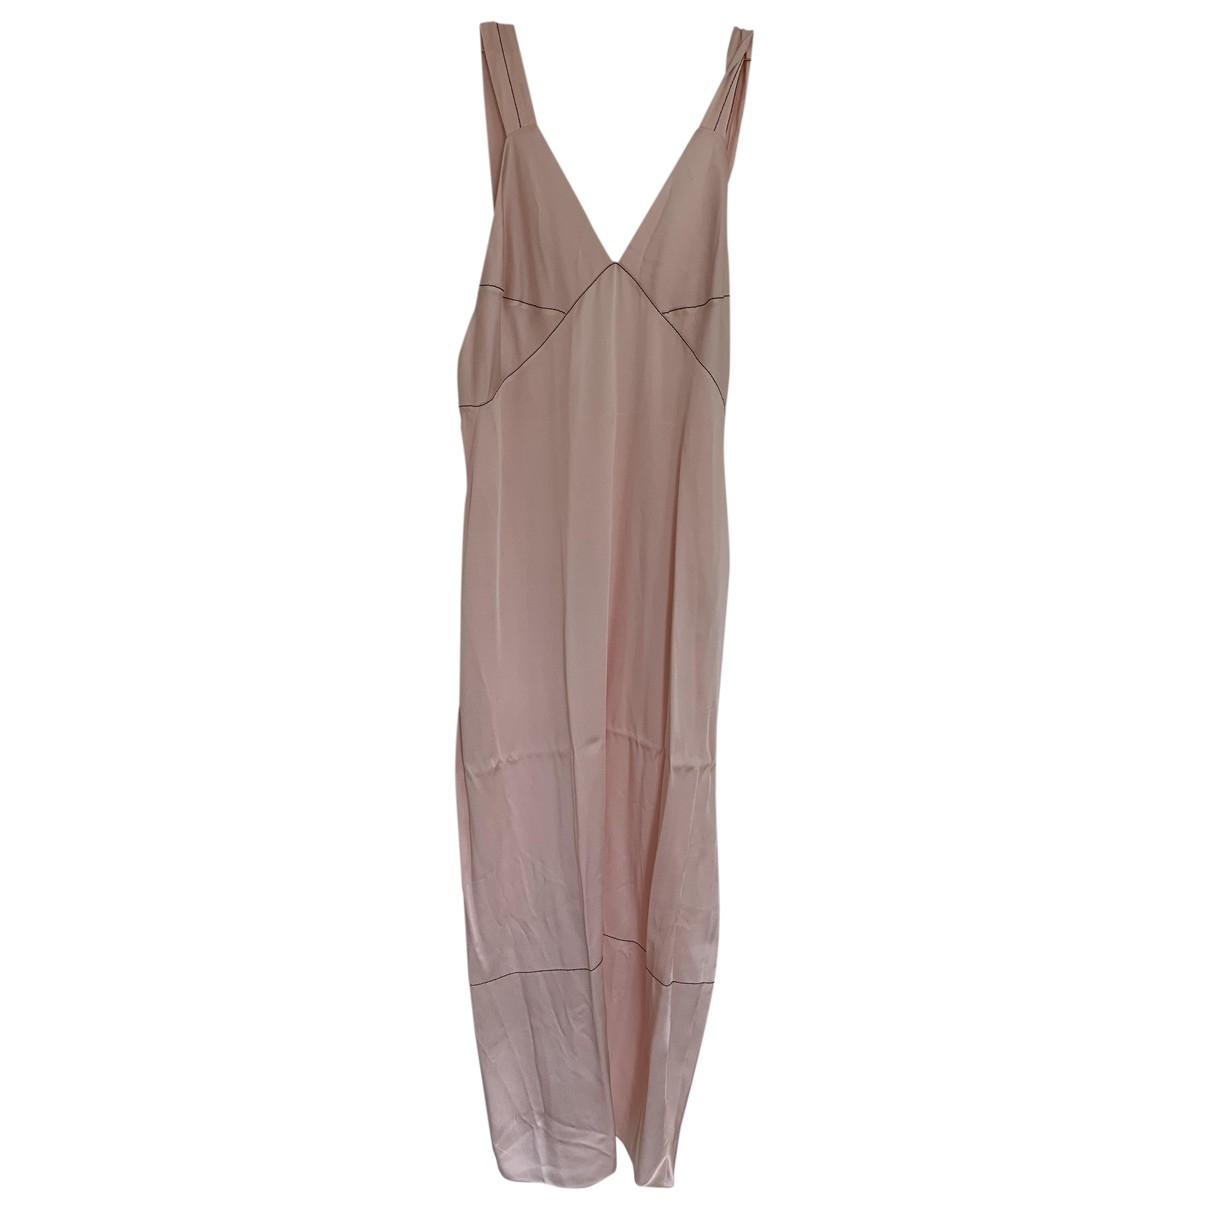 Zara \N Pink dress for Women M International